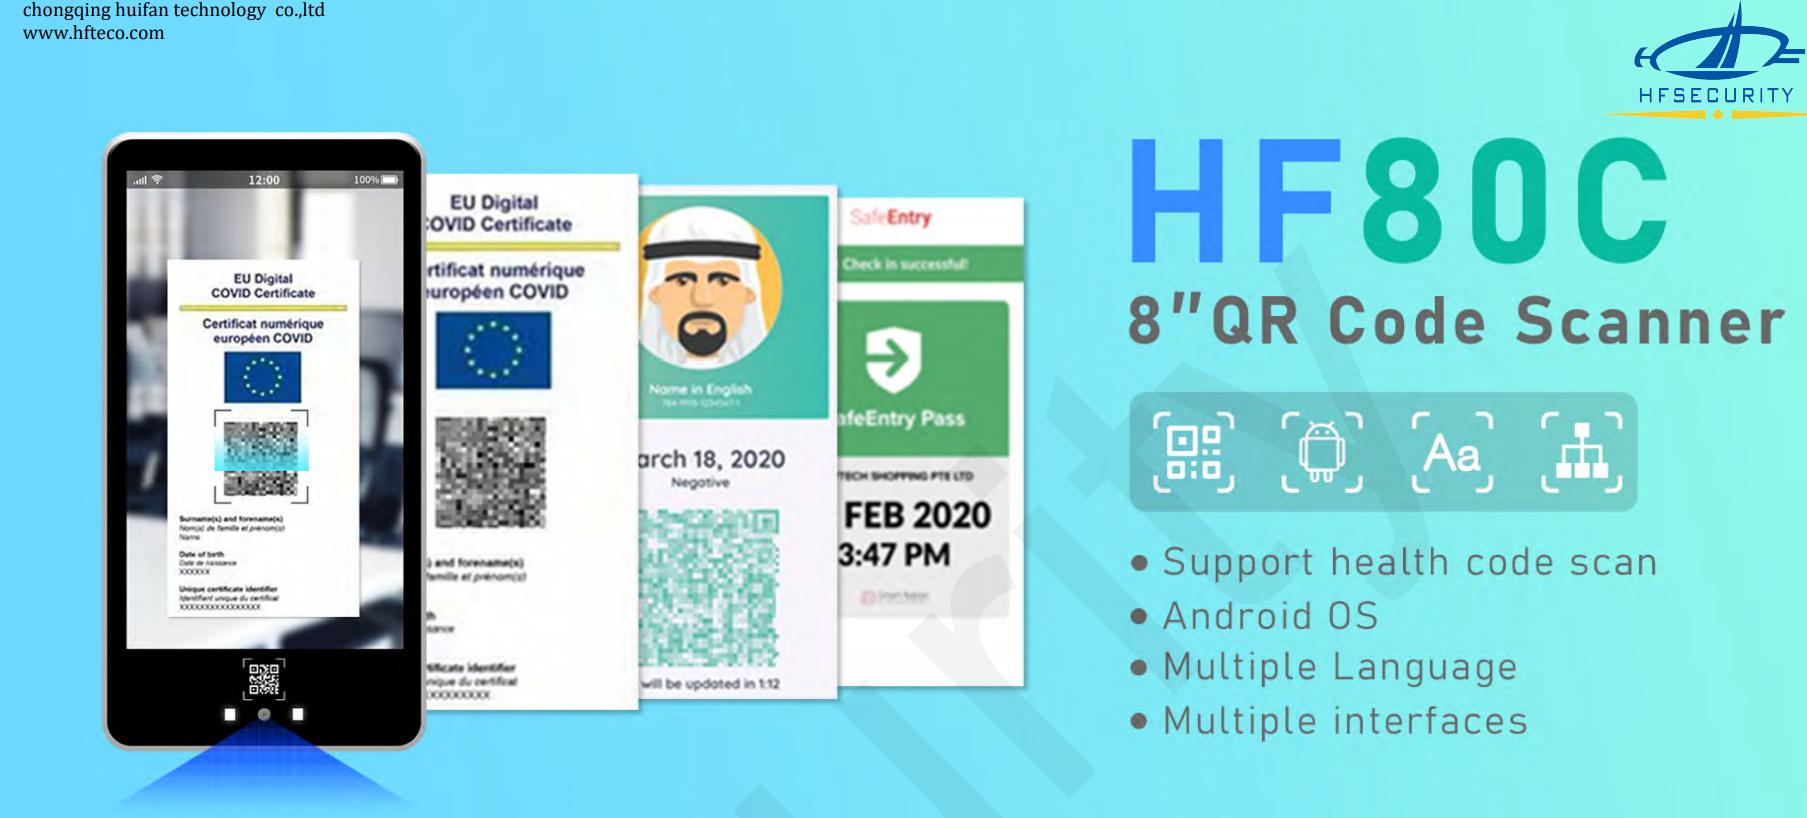 HF80C 8 inch Health Code Scan Device